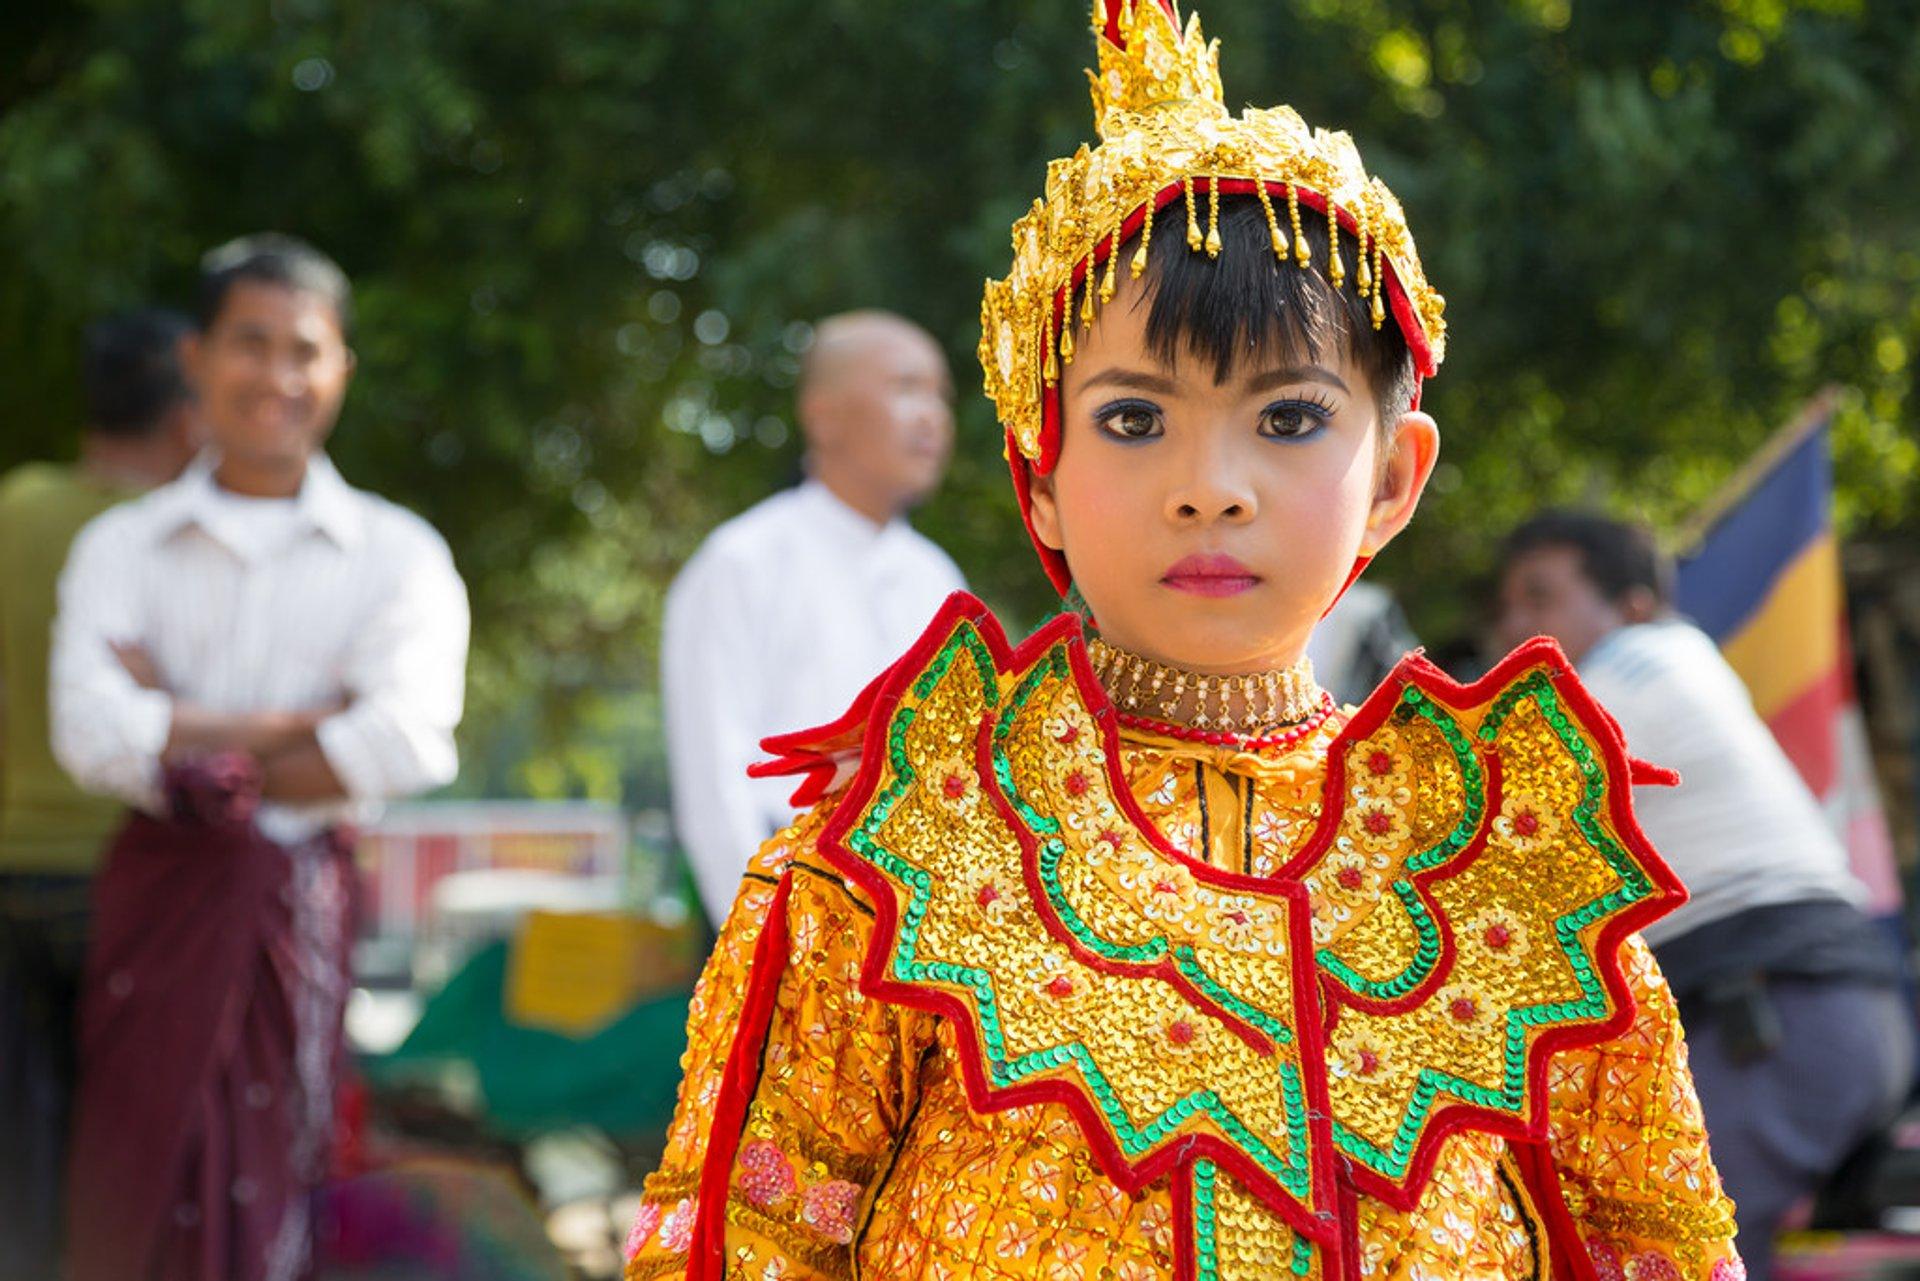 Novitiation Ceremony or Shinbyu in Myanmar - Best Season 2020